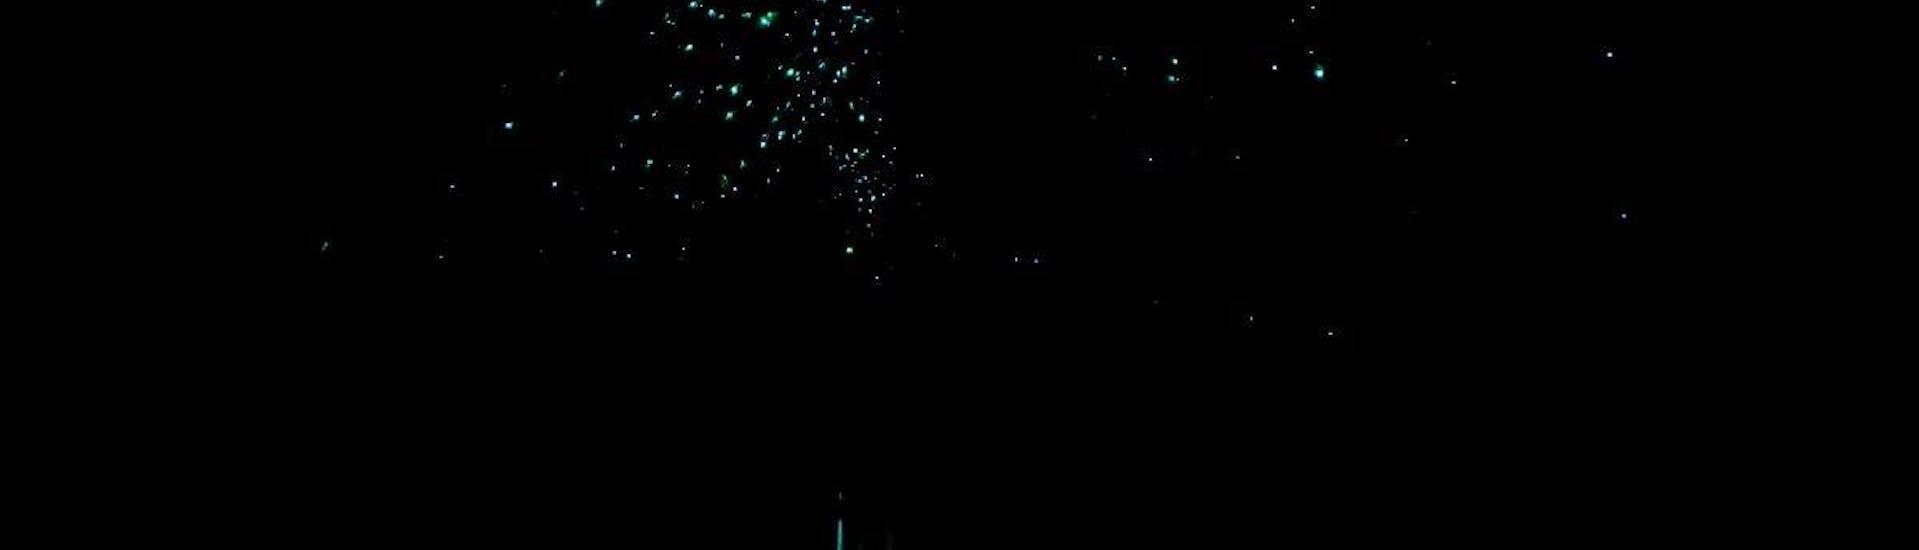 Kayak Rotorua - Twilight Glow Worm Tour Summer